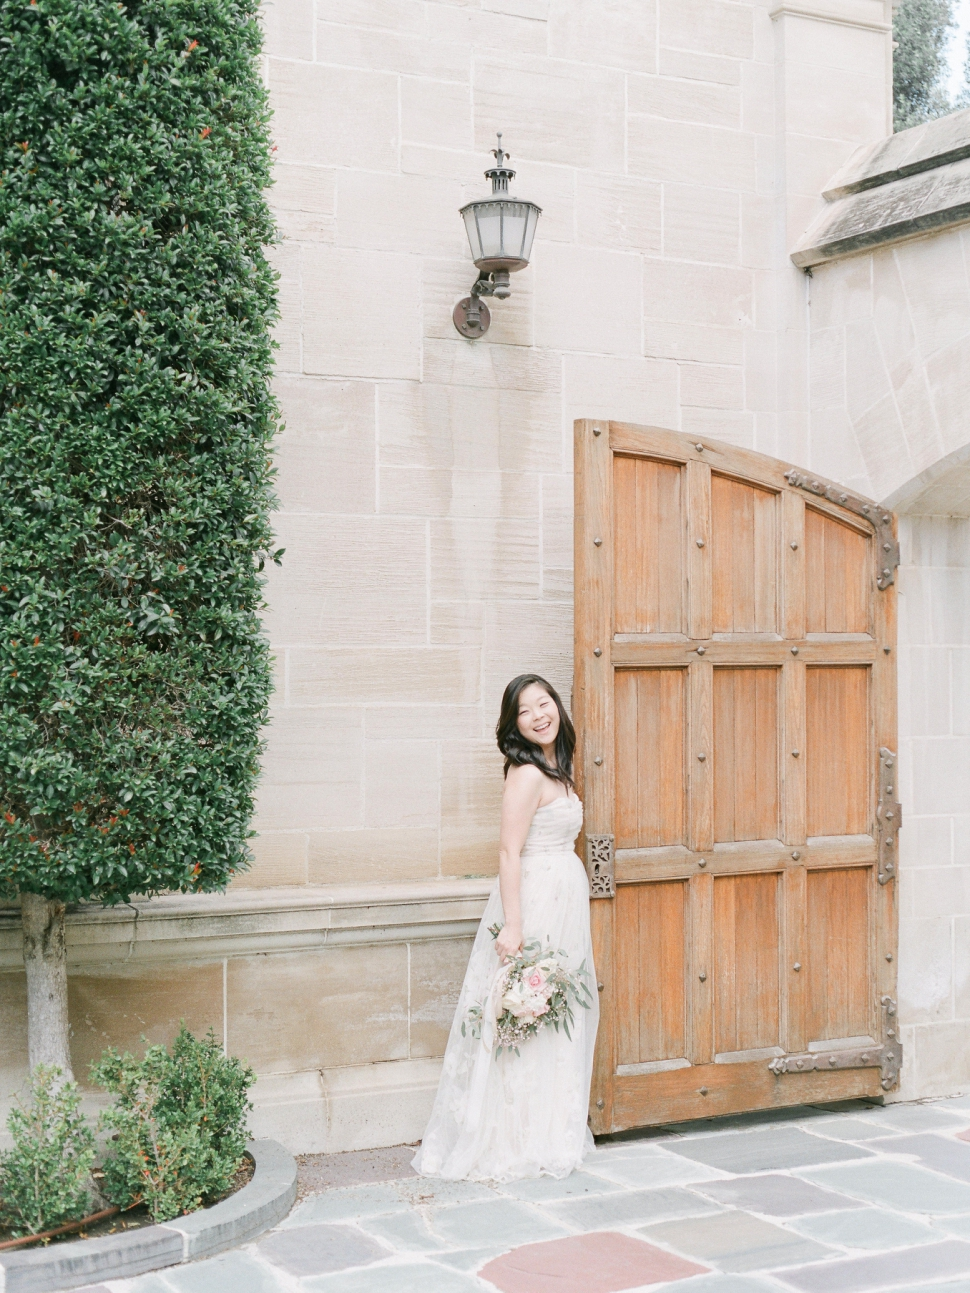 Southern-California-Wedding-Photographer-Cassi-Claire-Greystone-Mansion-Beverly-Hills-CA-wedding_11.jpg